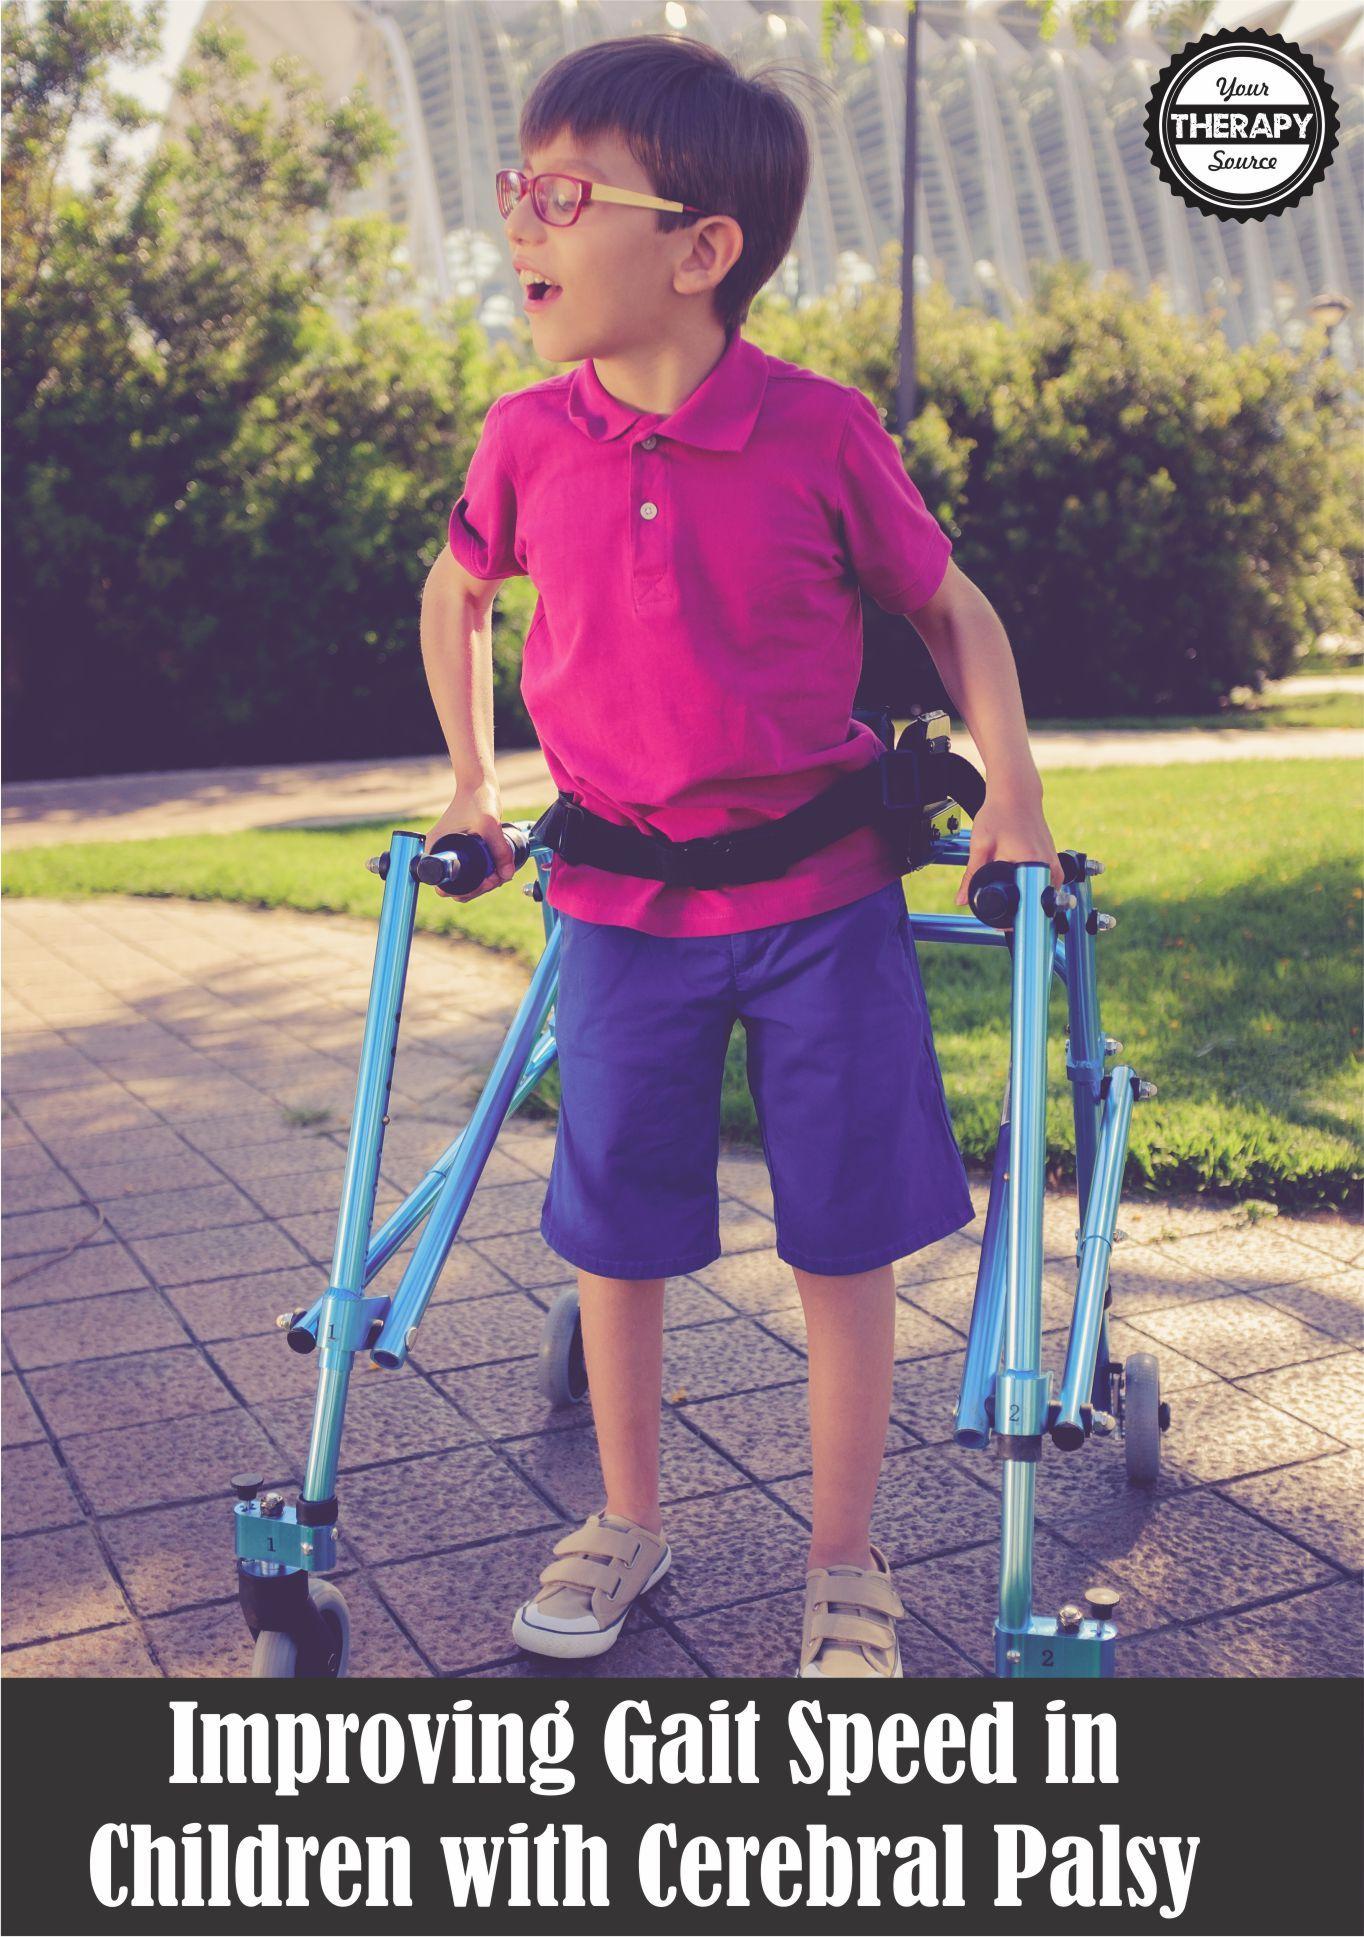 Improving Gait Speed In Children With Cerebral Palsy